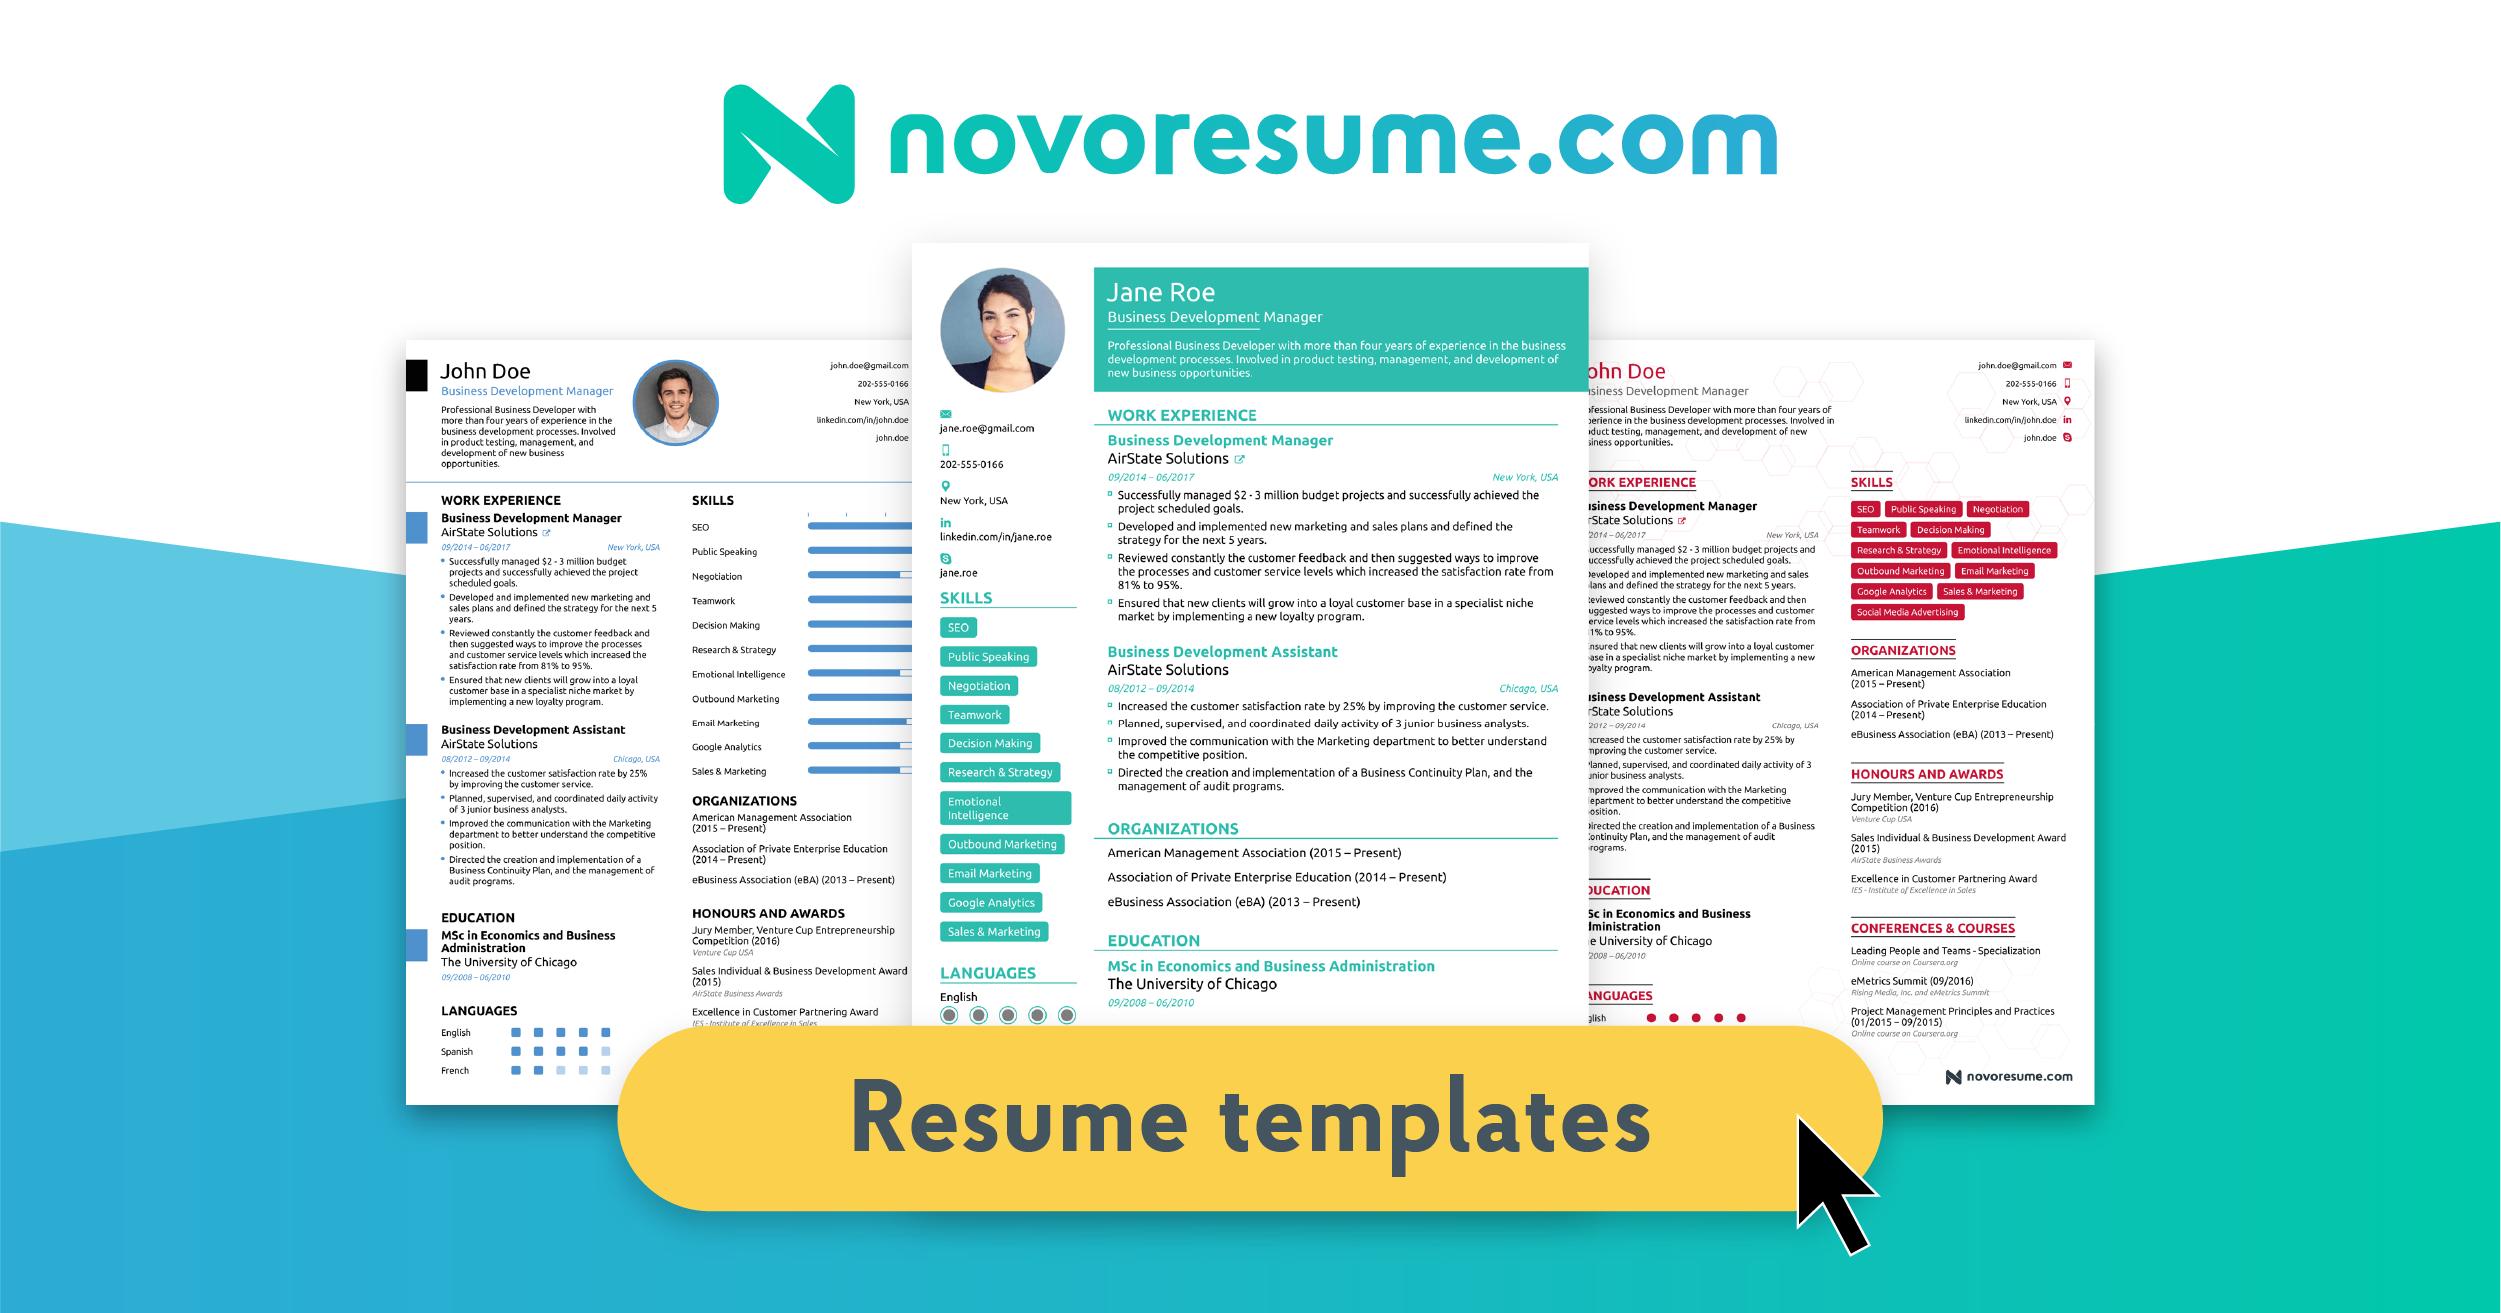 Resume Images Free Download